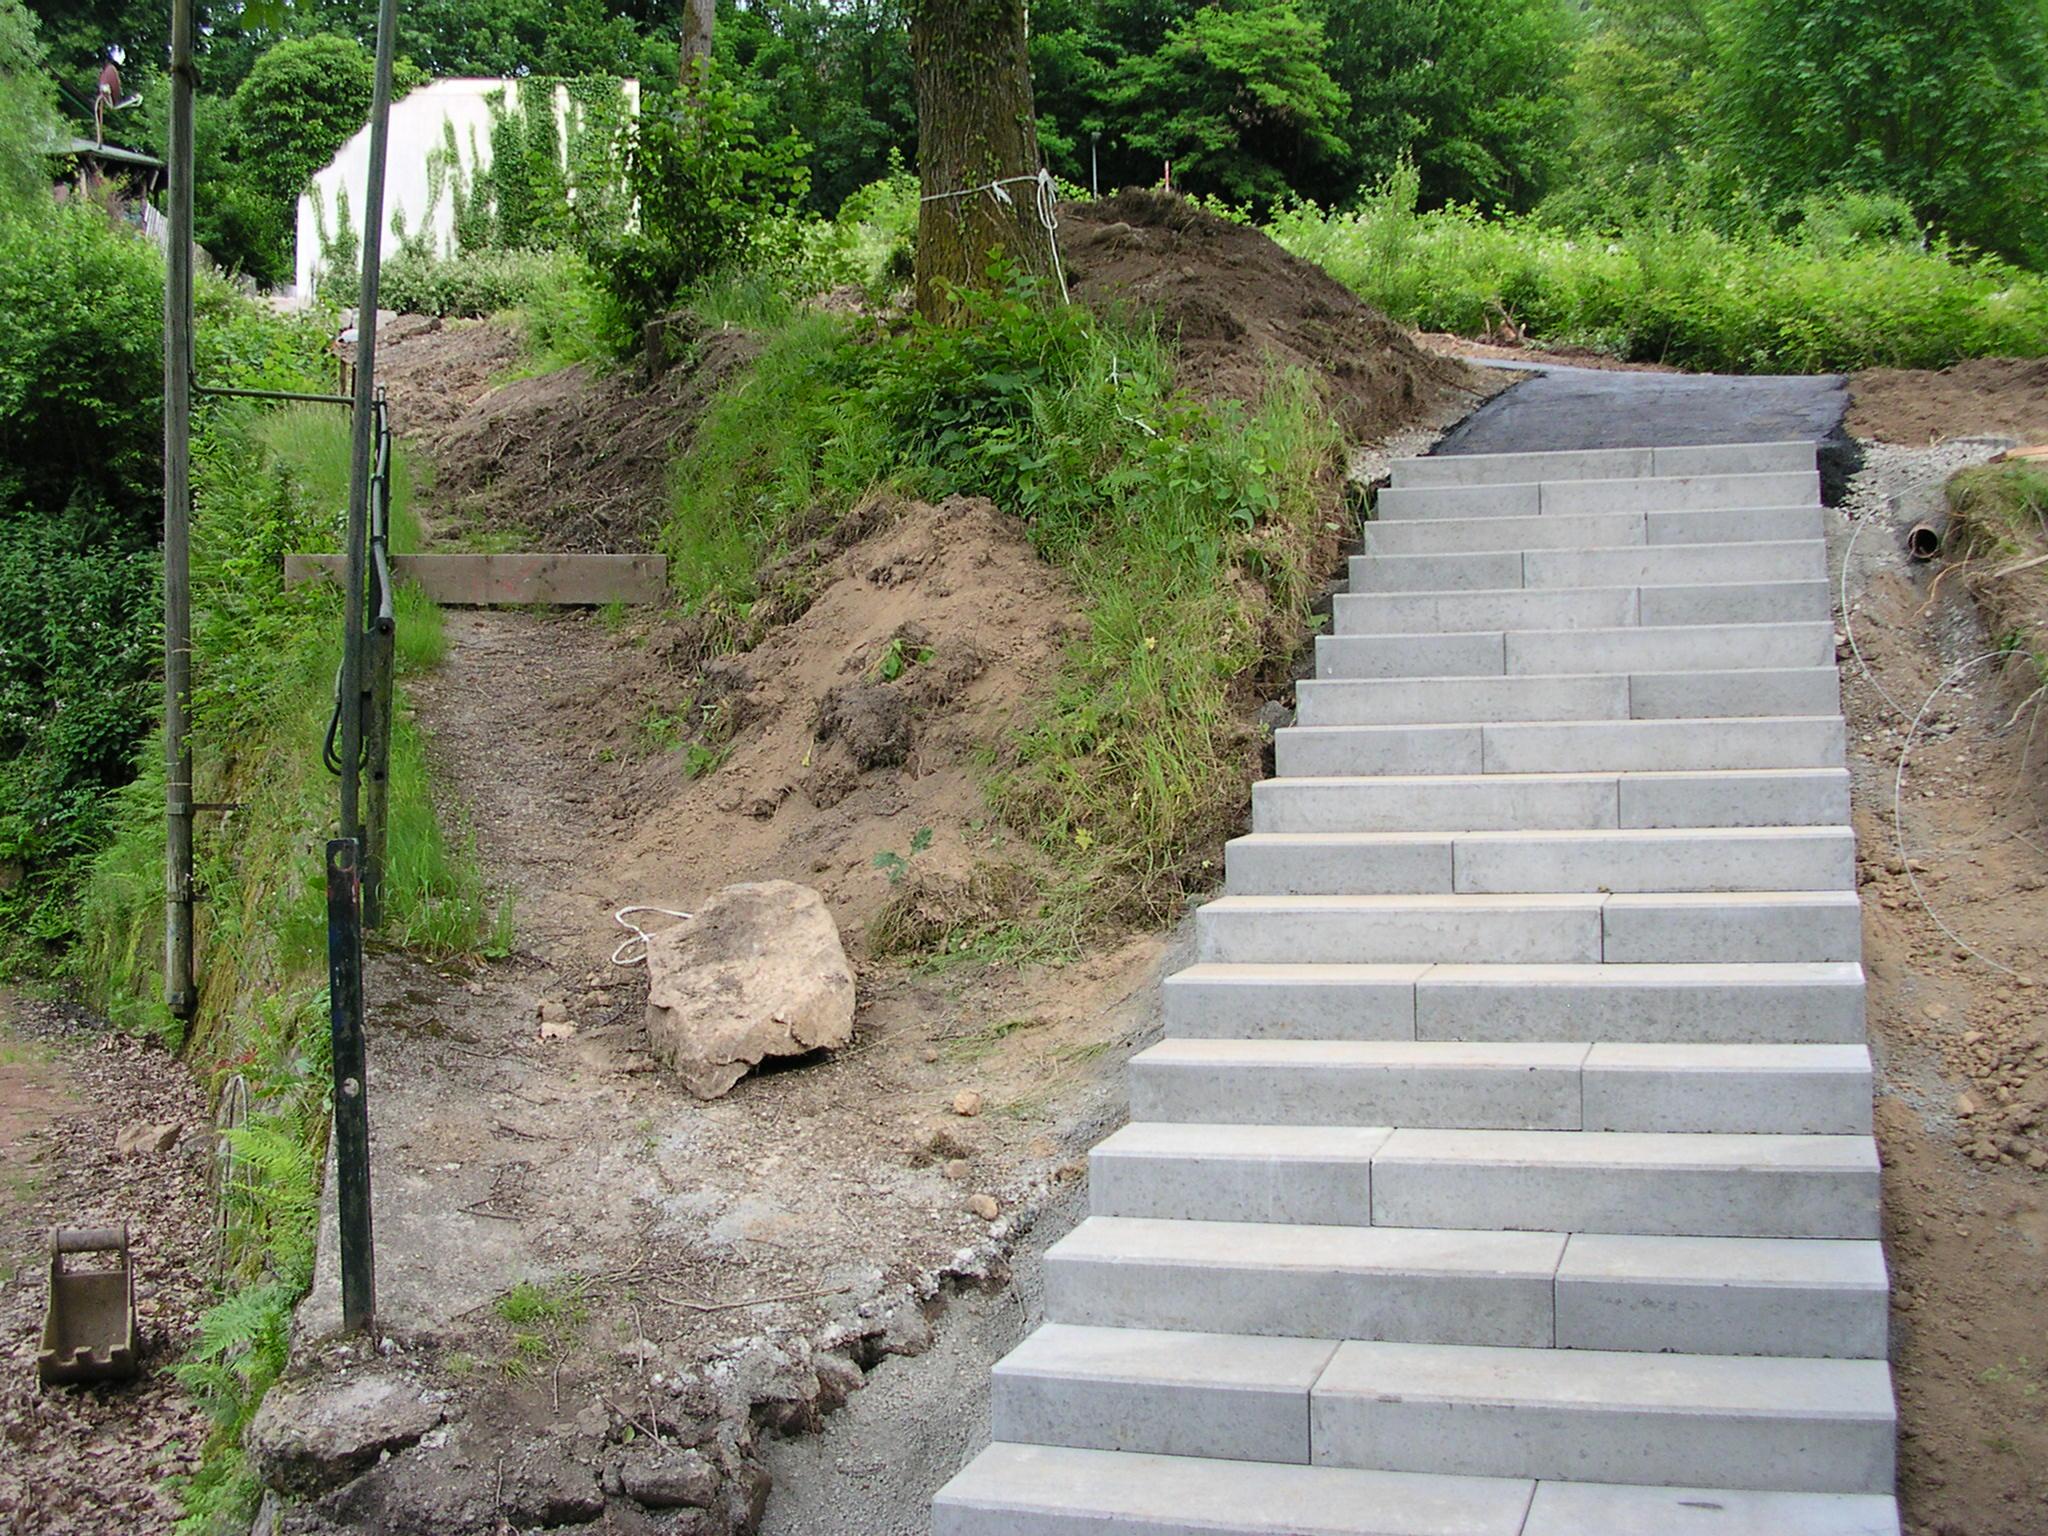 Neuer Zugangsweg zum Sportplatz Langenbrand (15)